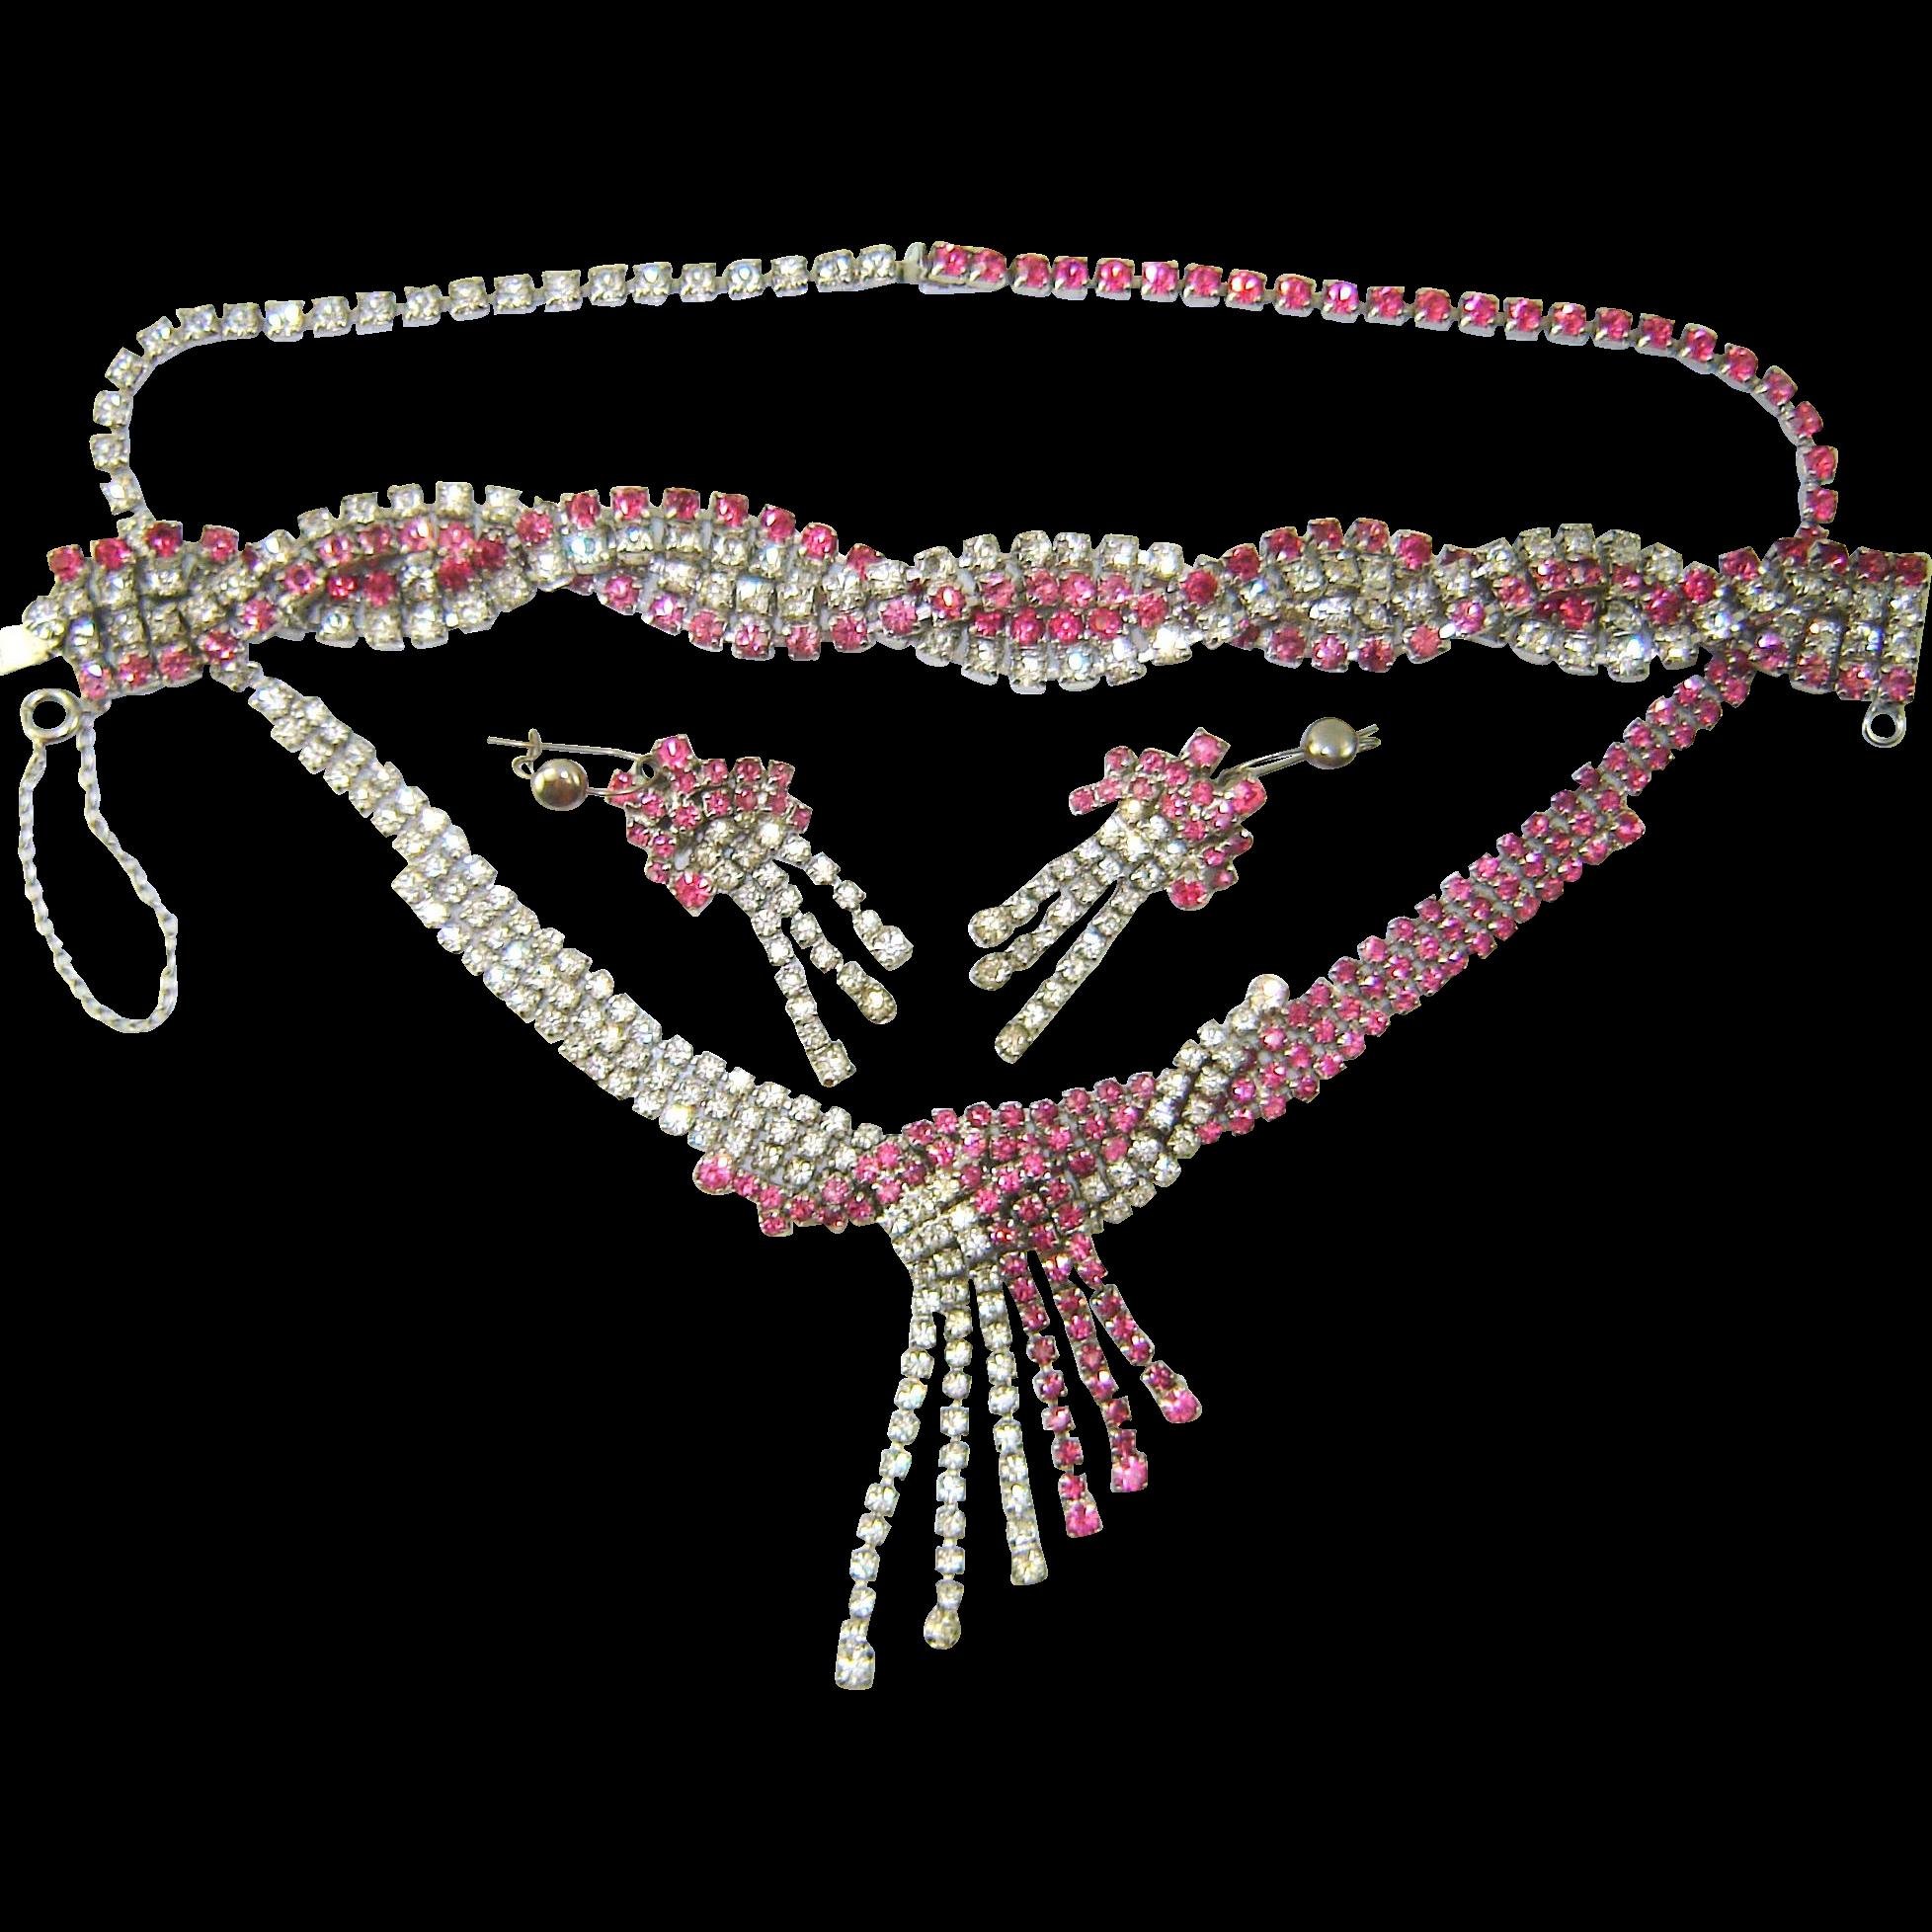 Vintage Necklace Bracelet Earrings Dangle RASPBERRY Pink Rhinestone Set